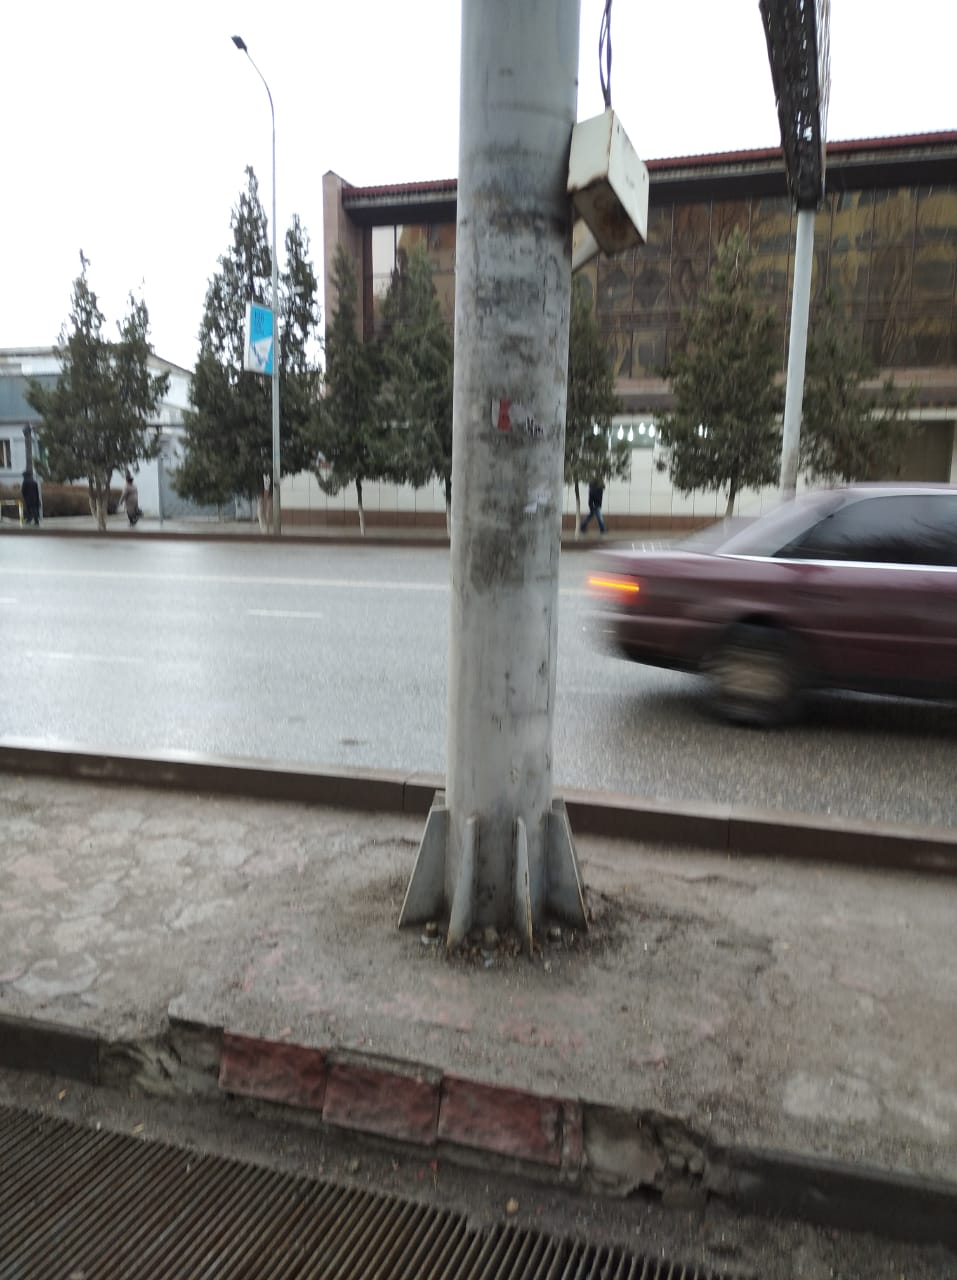 https://inbusiness.kz/ru/images/original/37/images/qmg564sf.jpg